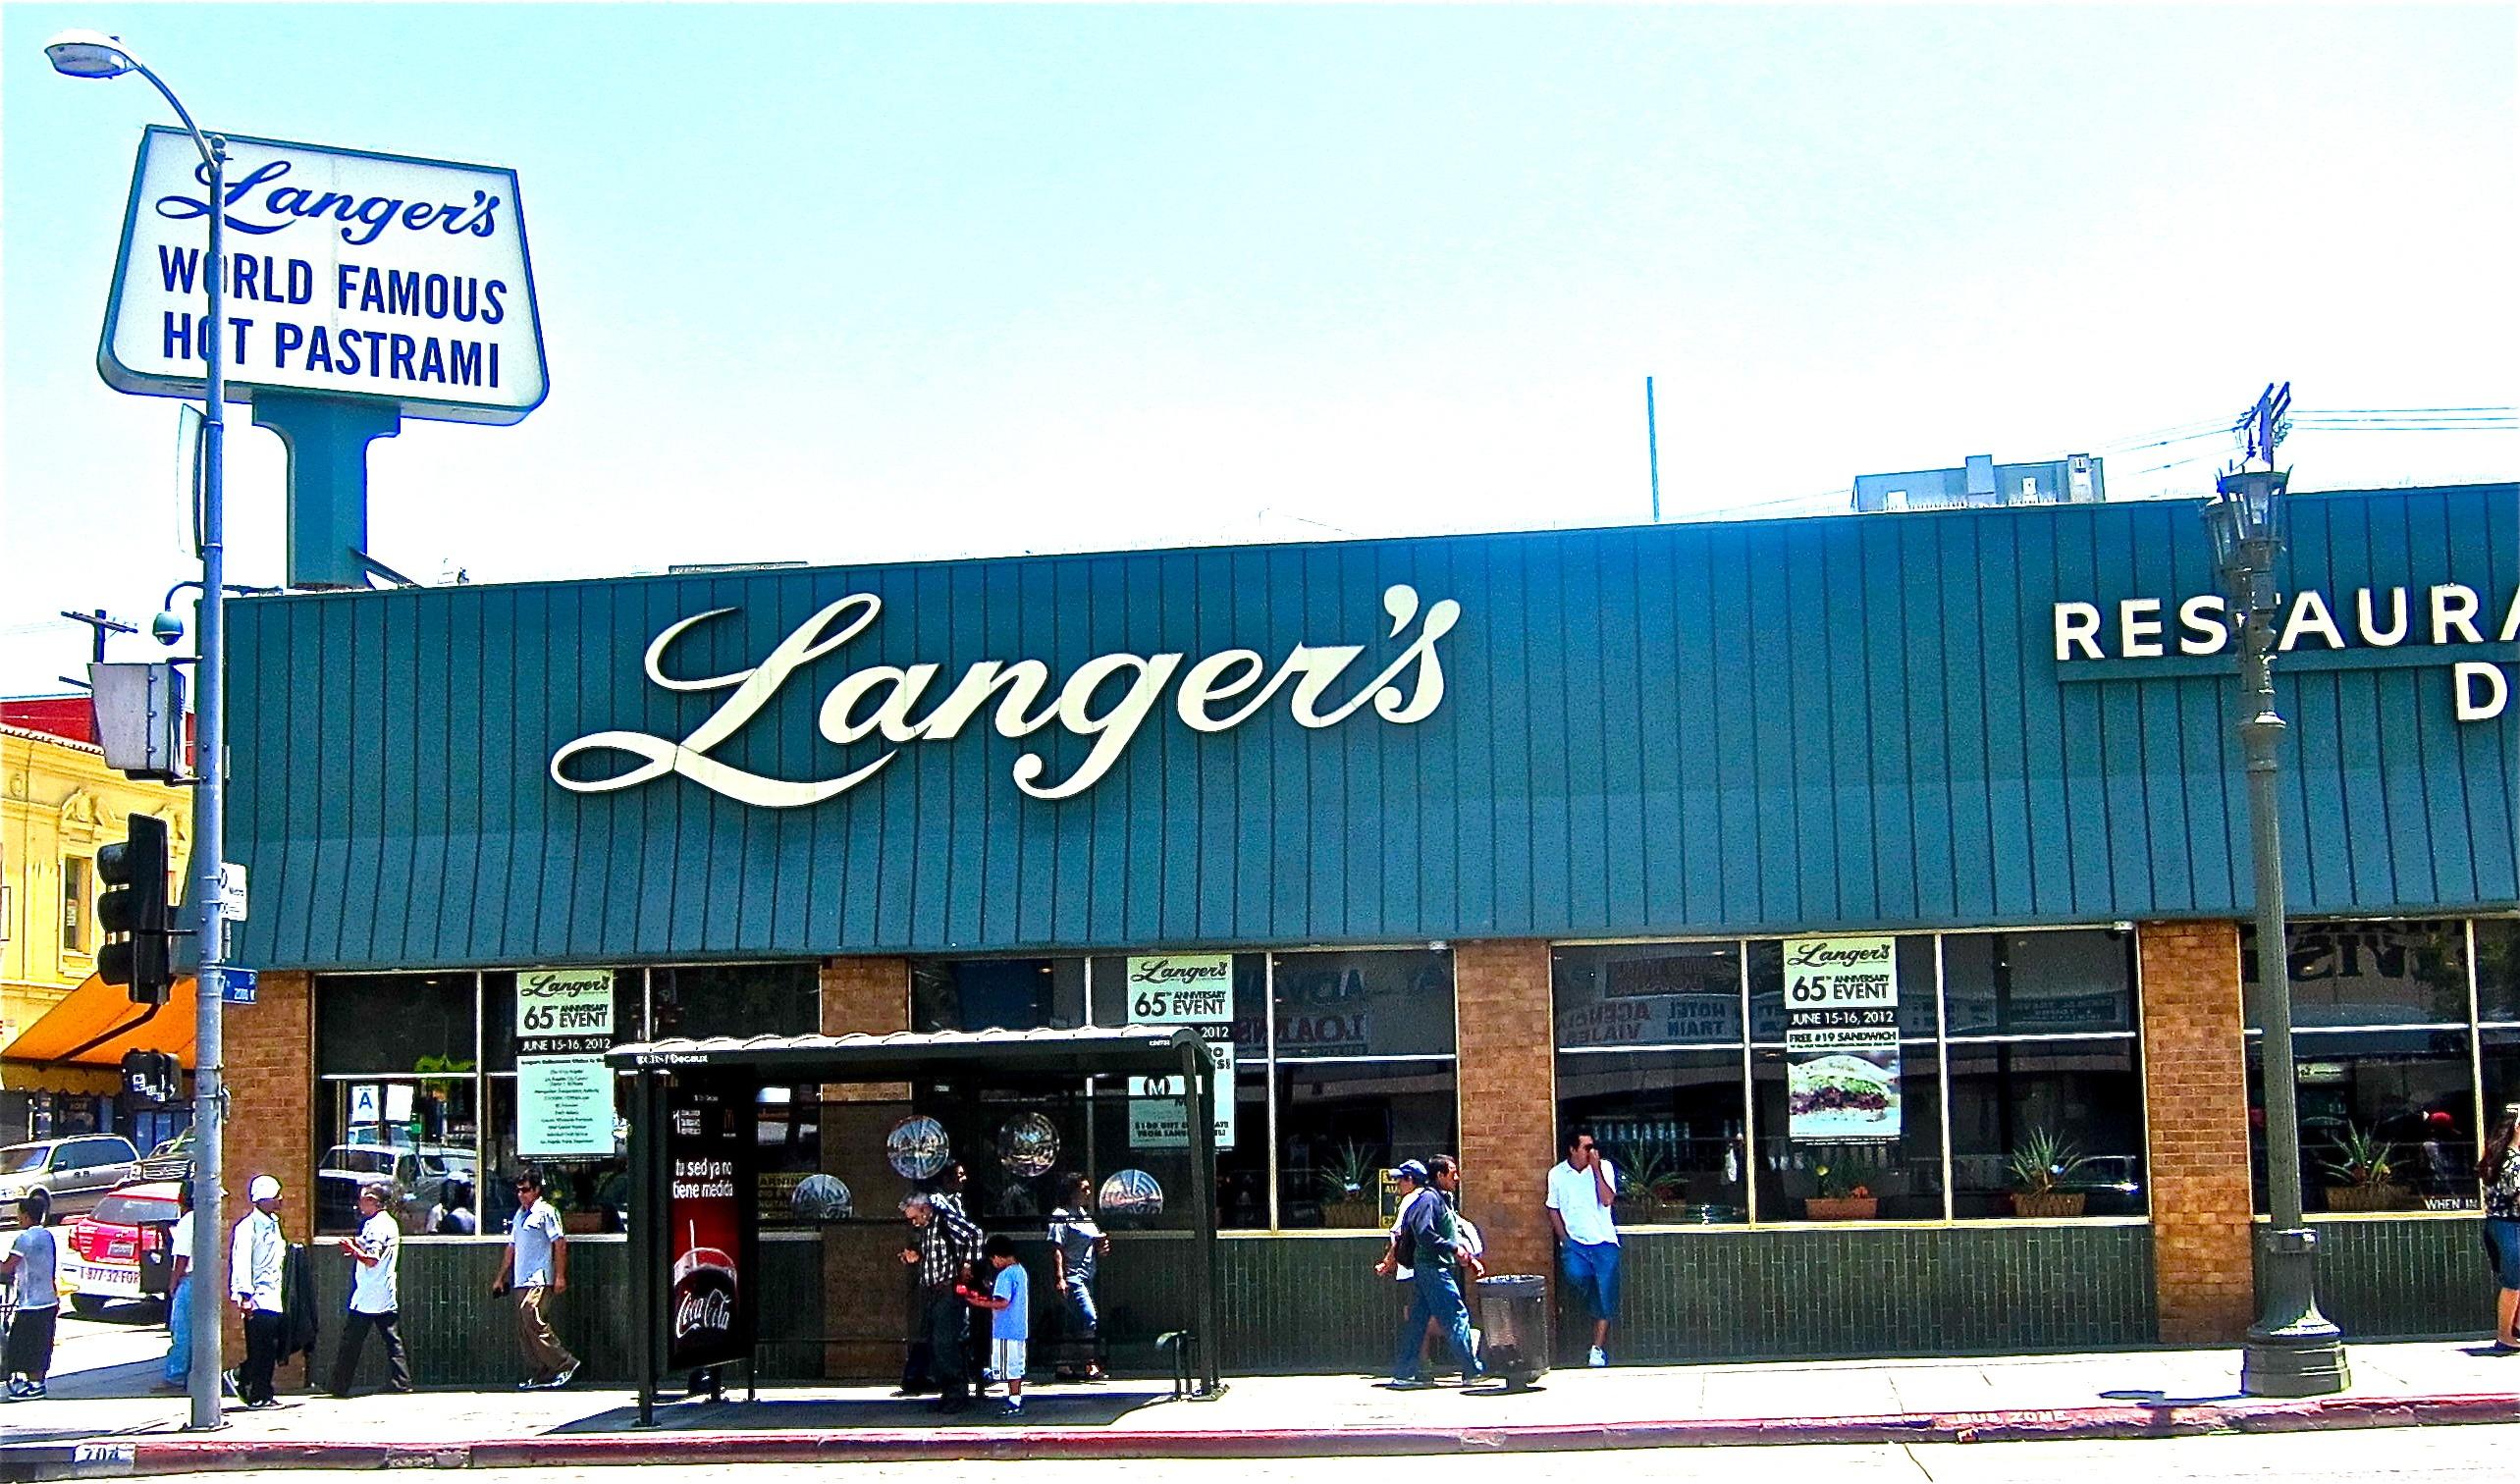 Langer's exterior